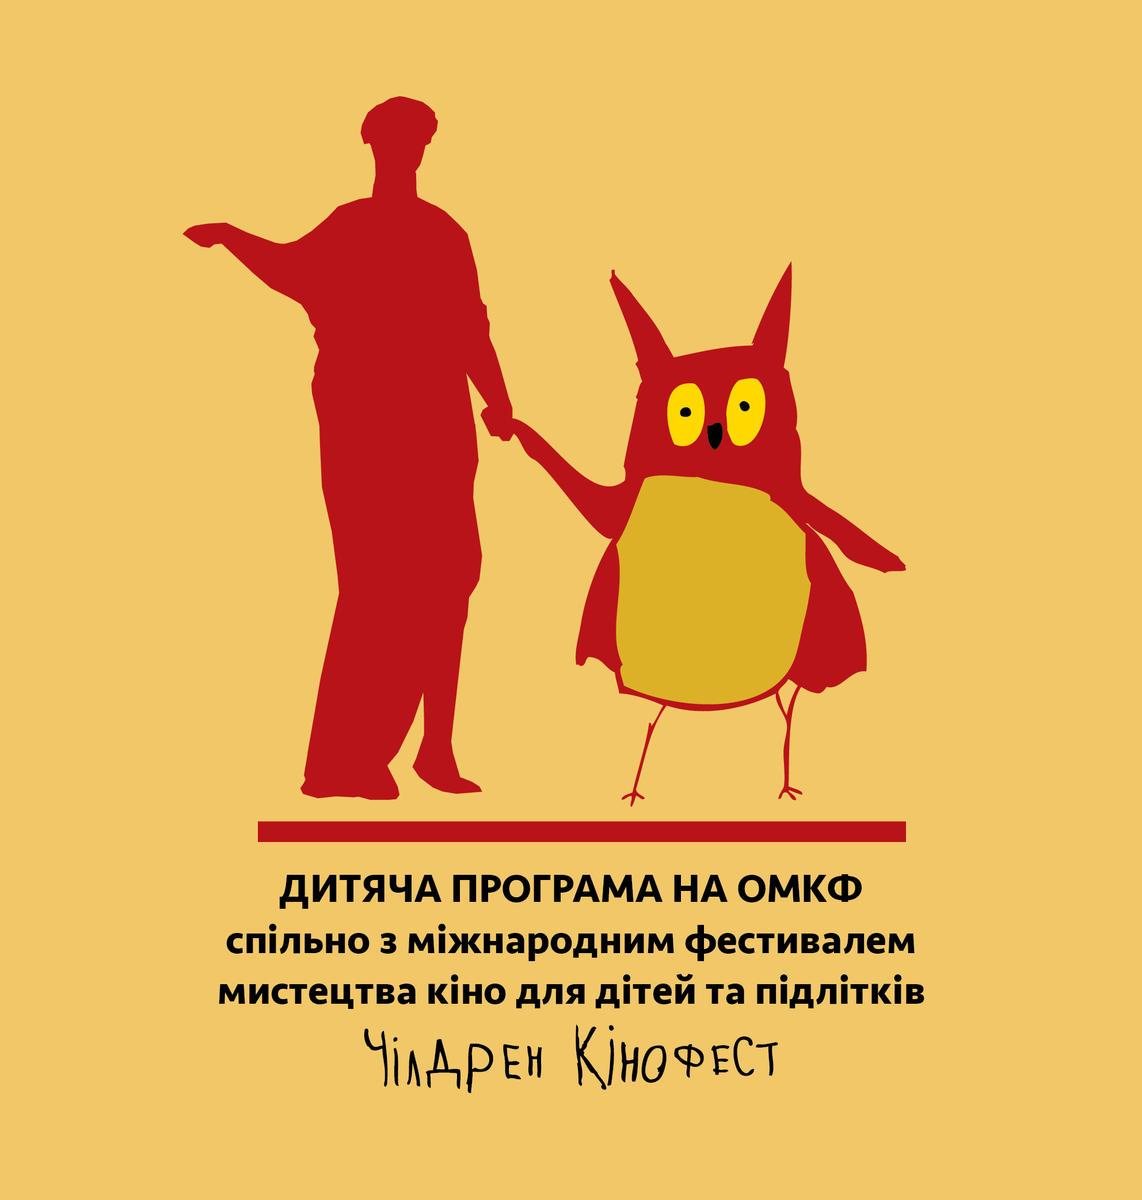 Программа детского кино на Одесском кинофестивале